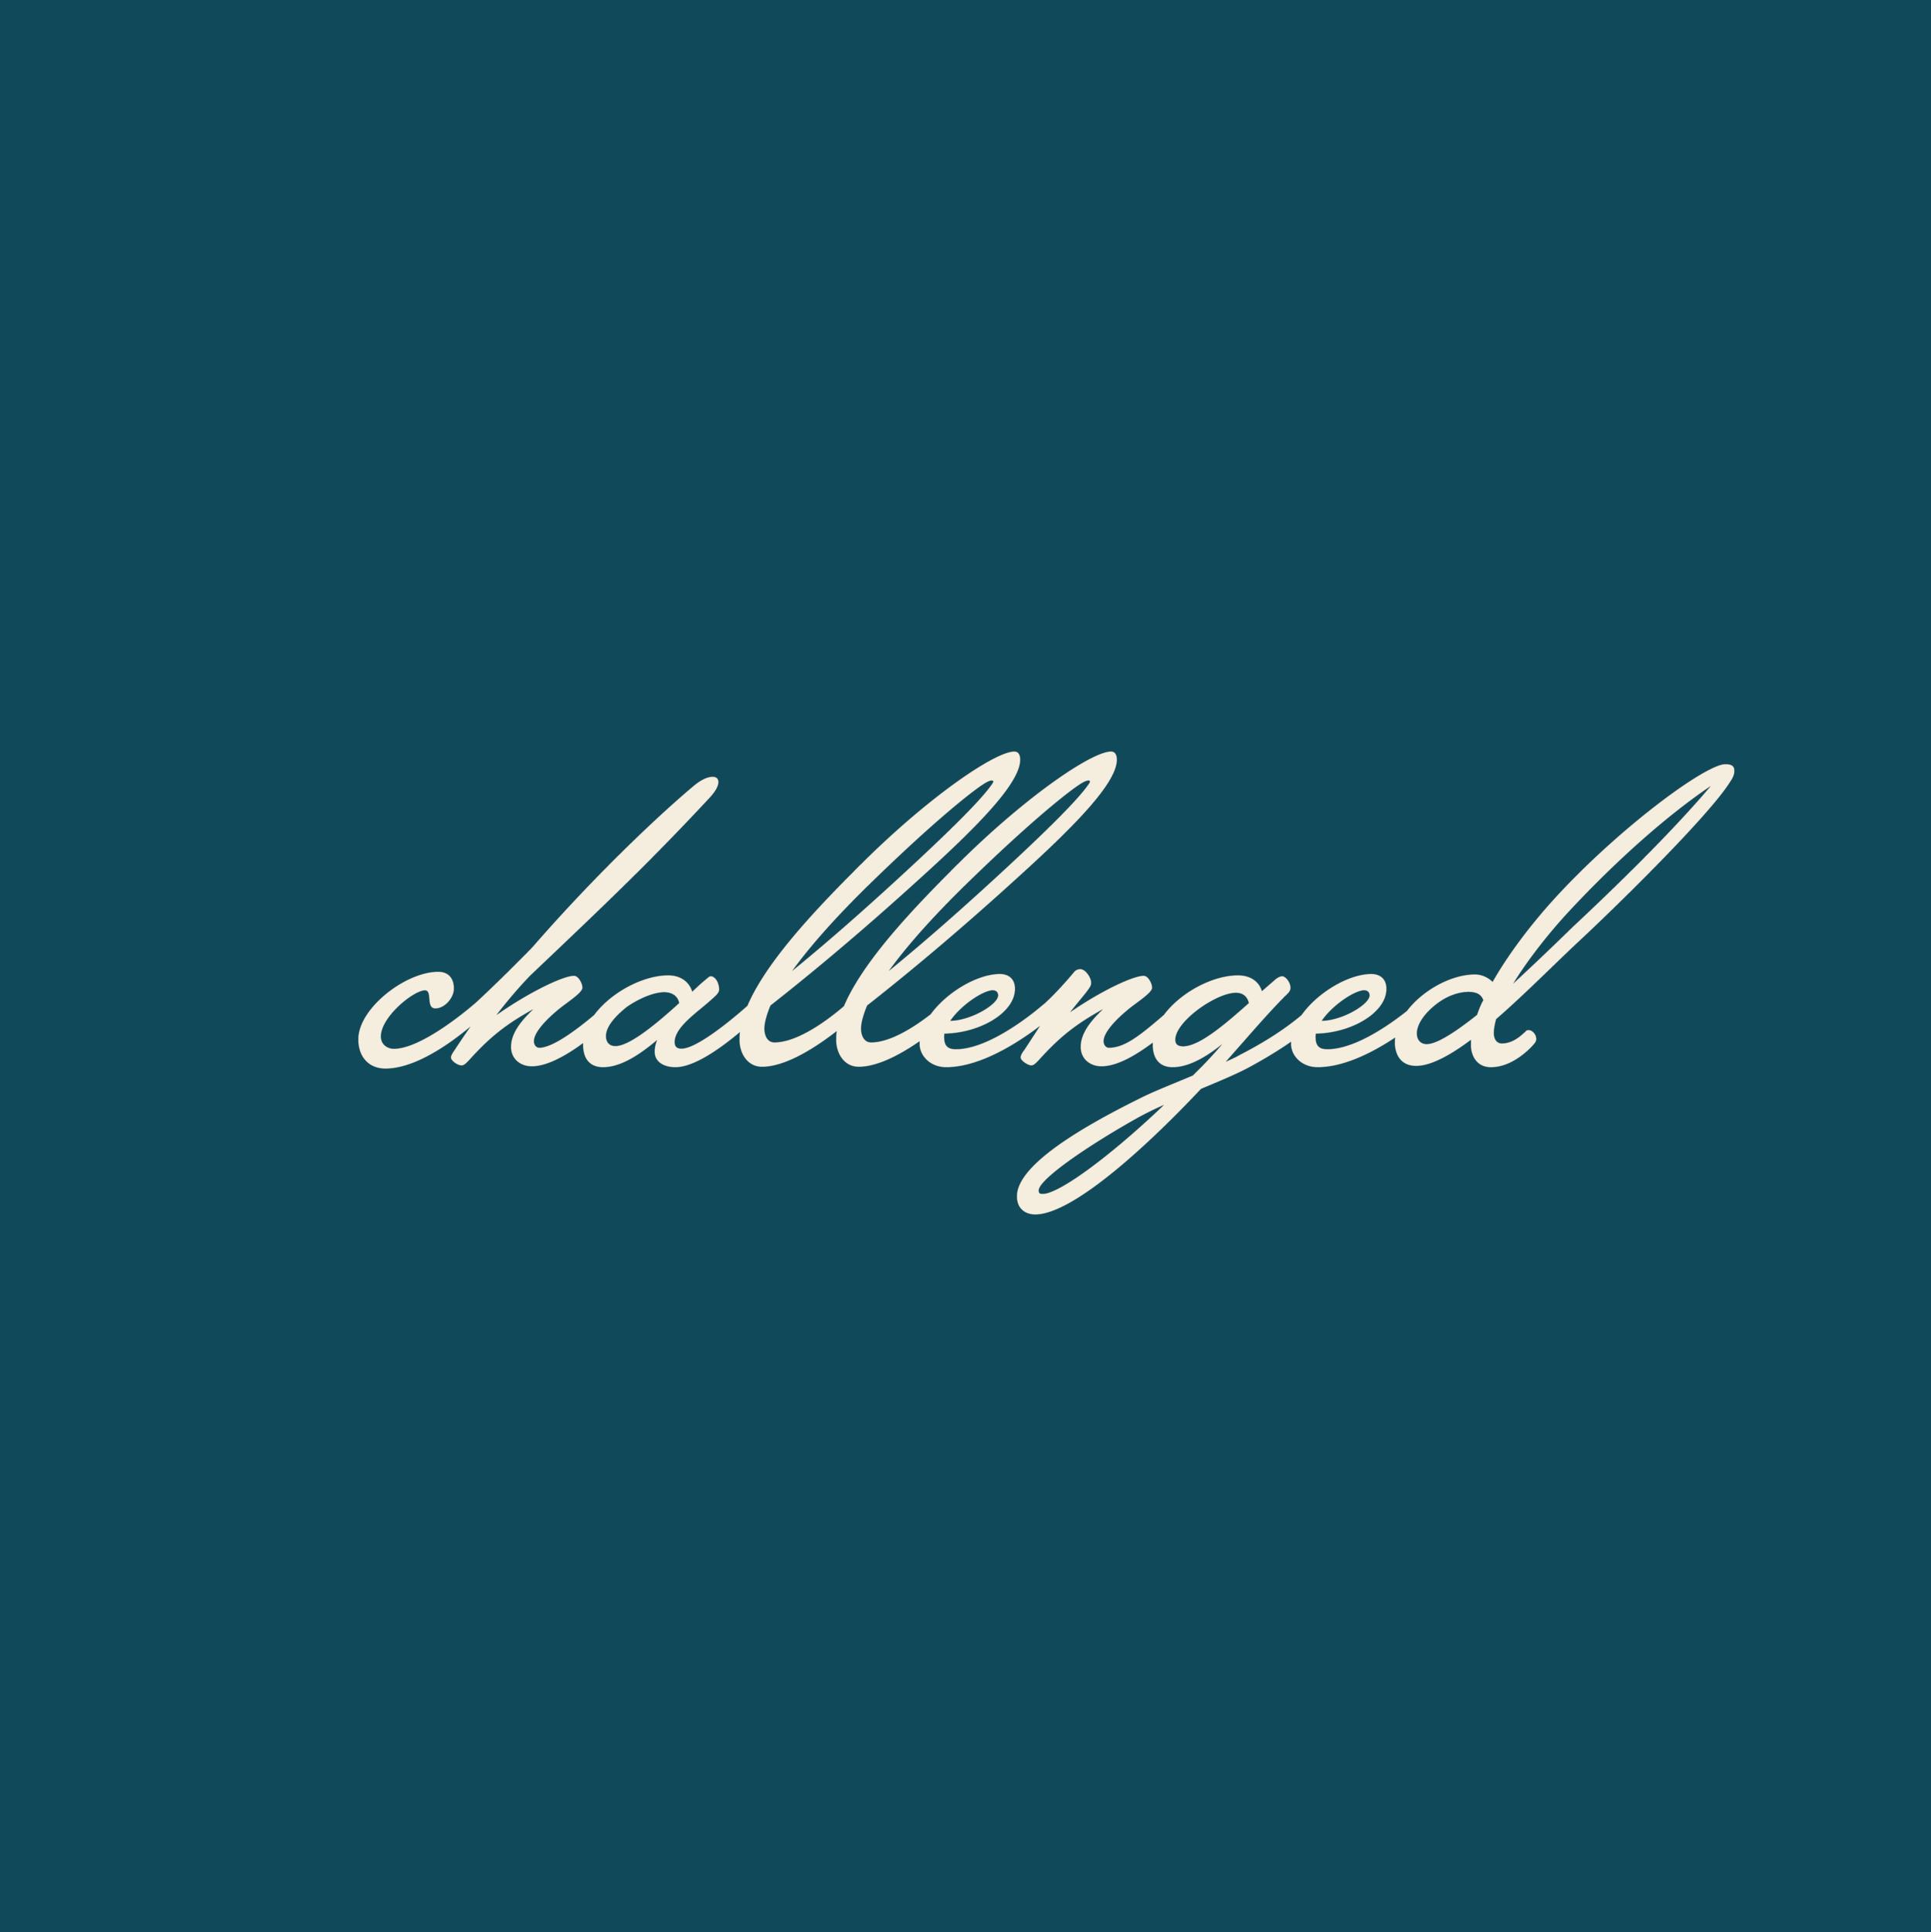 BIBKFLD_Tagline_Square_Challenged.png